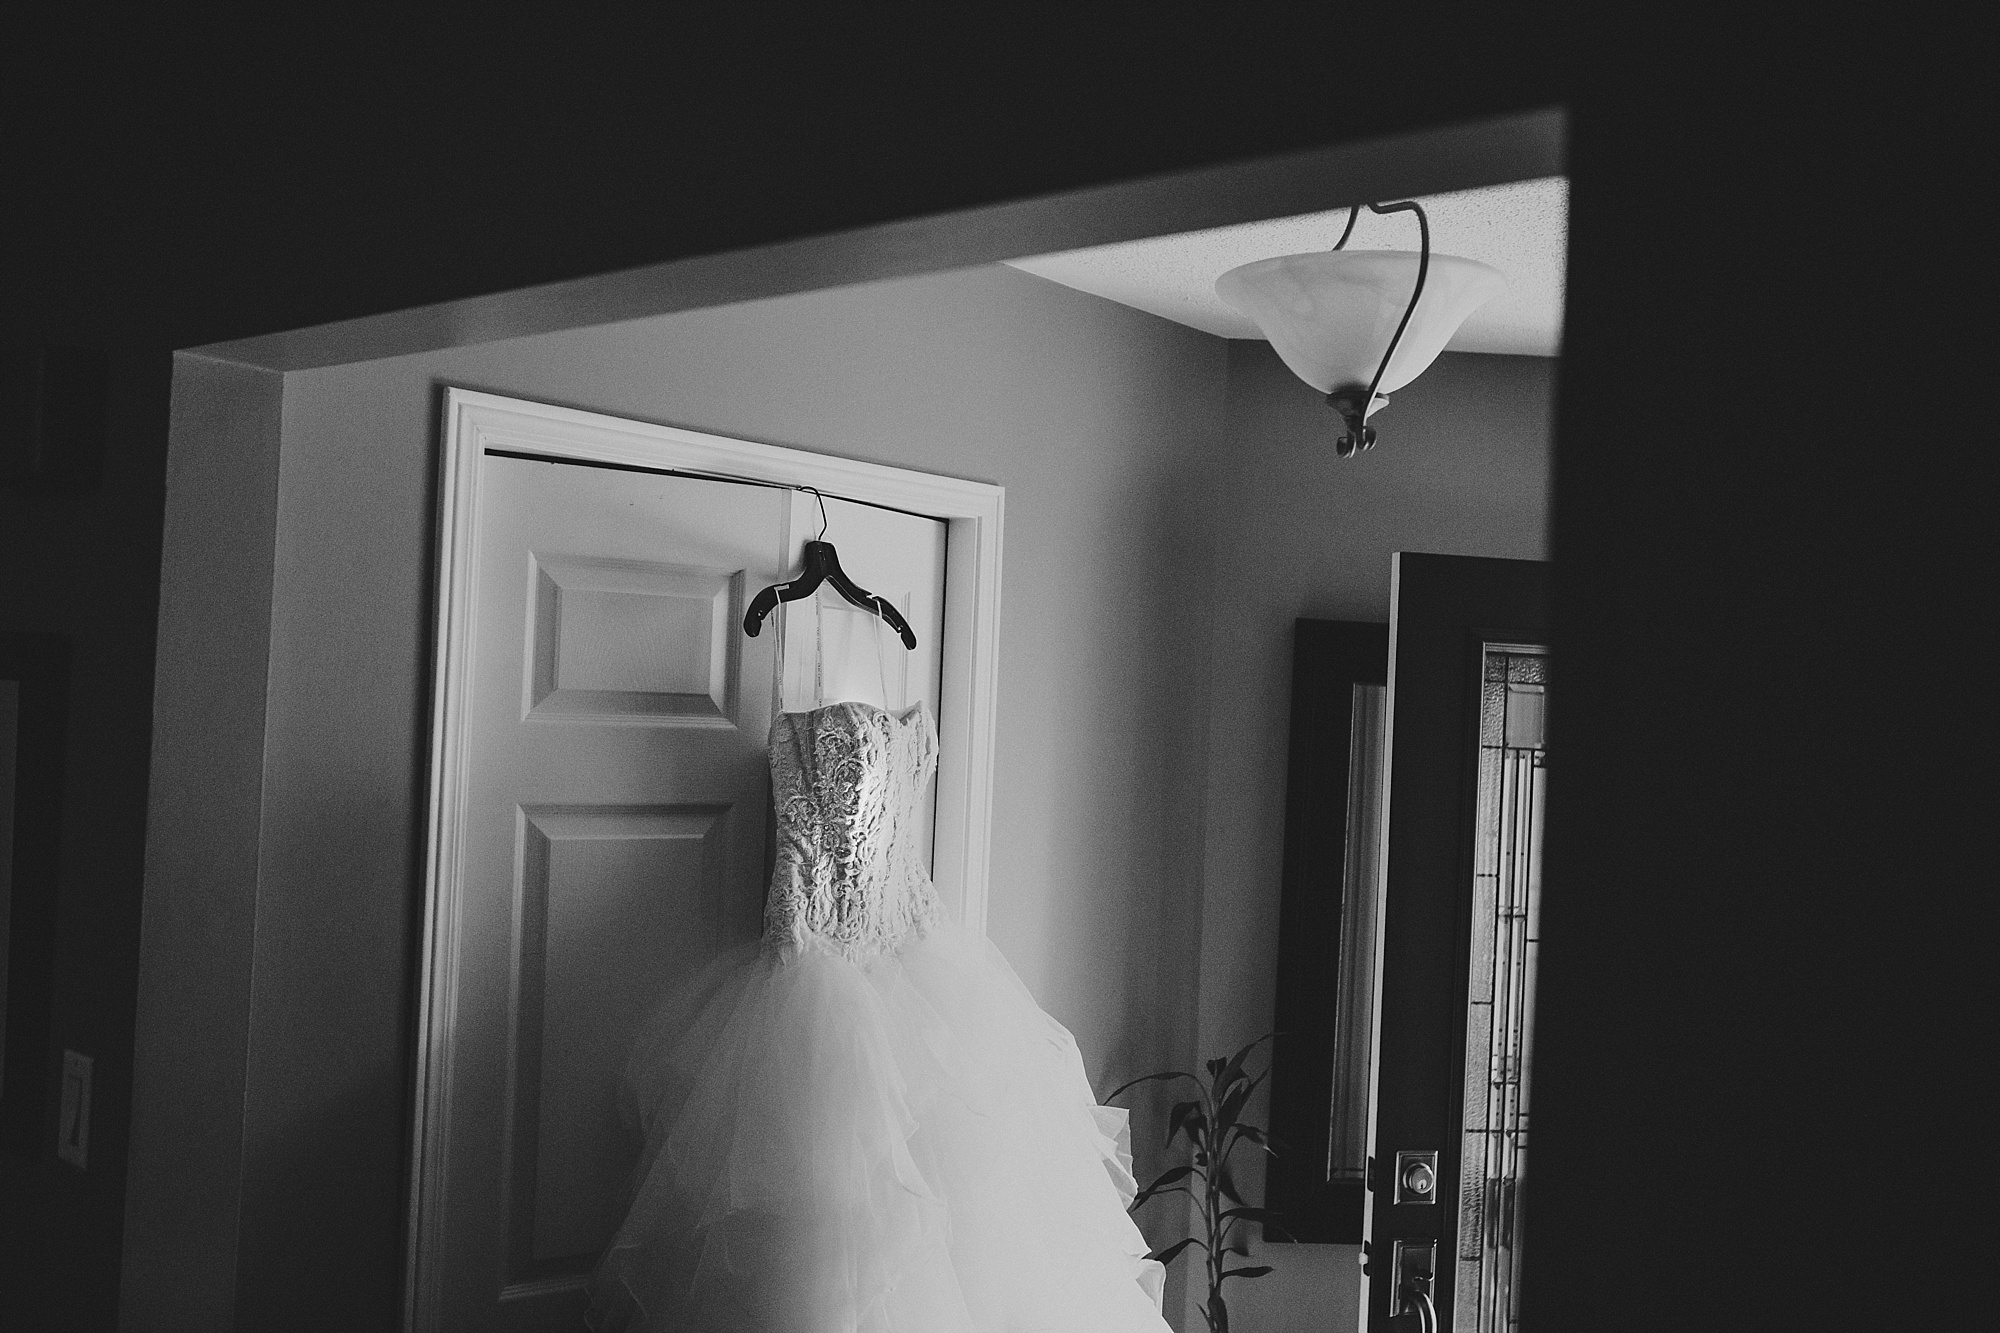 lipapark-hernderwinery-wedding_0003.jpg